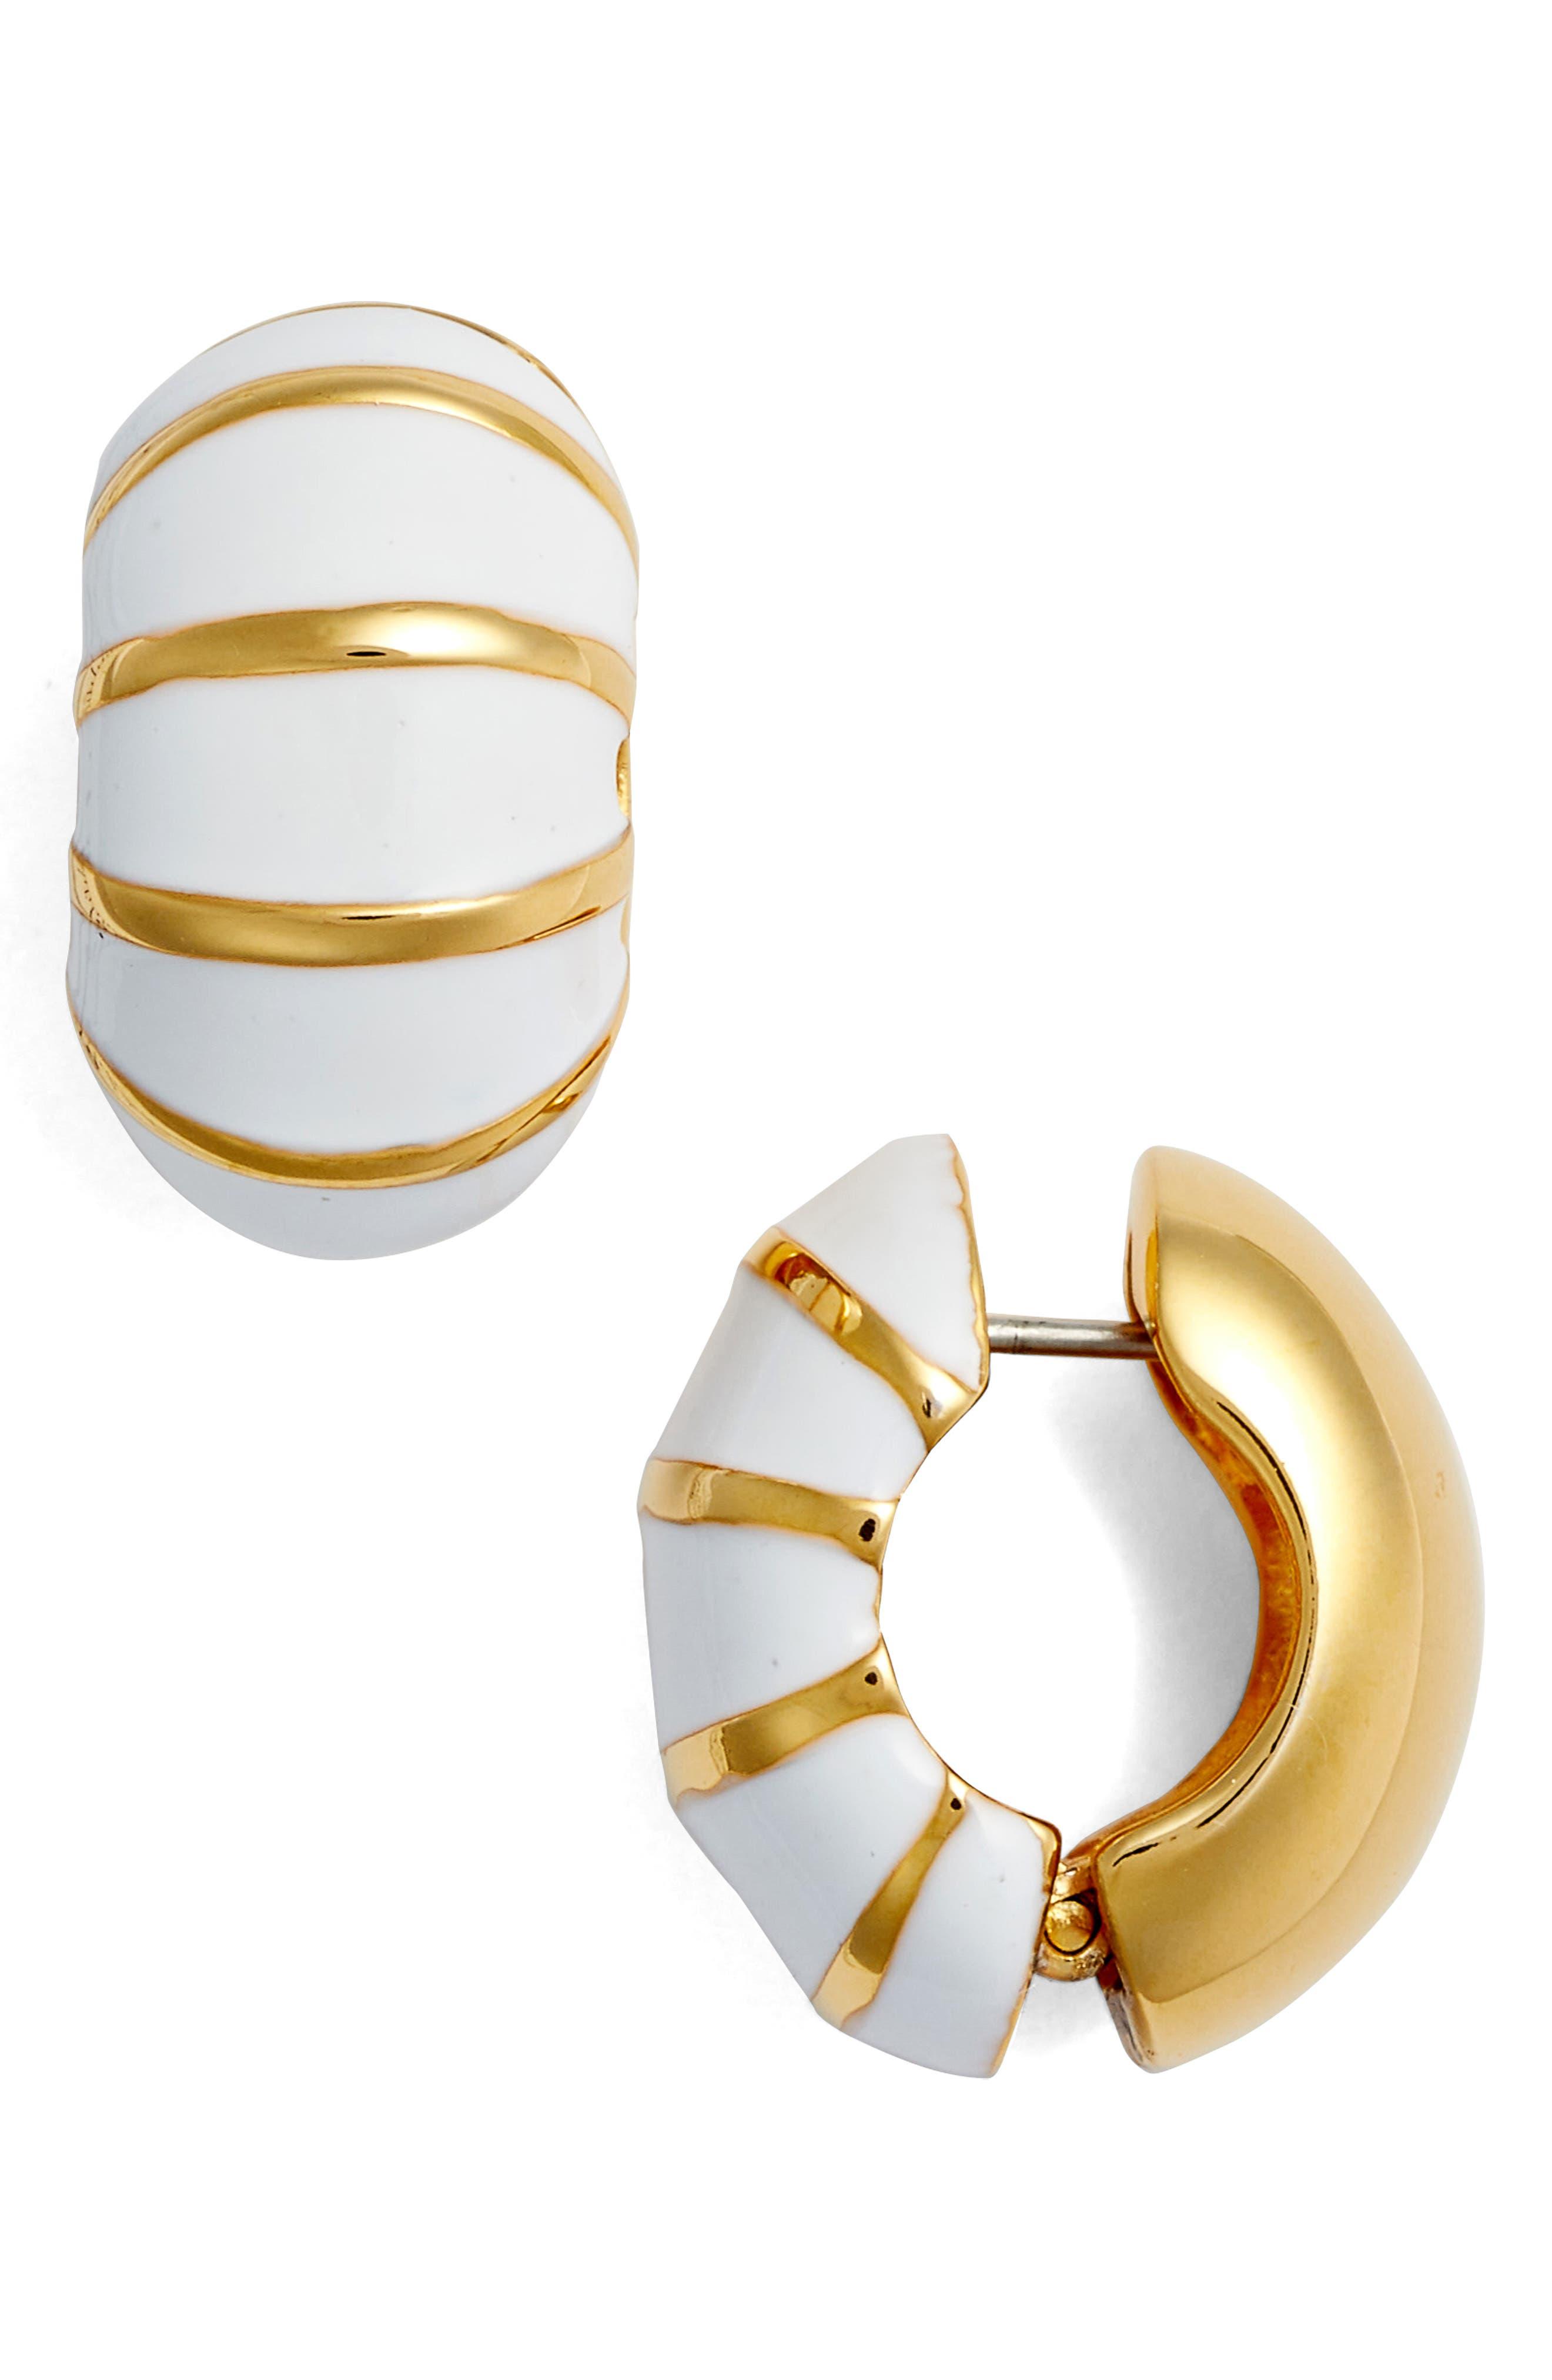 Goldtone & White Reversible Earrings,                         Main,                         color, White/ Gold